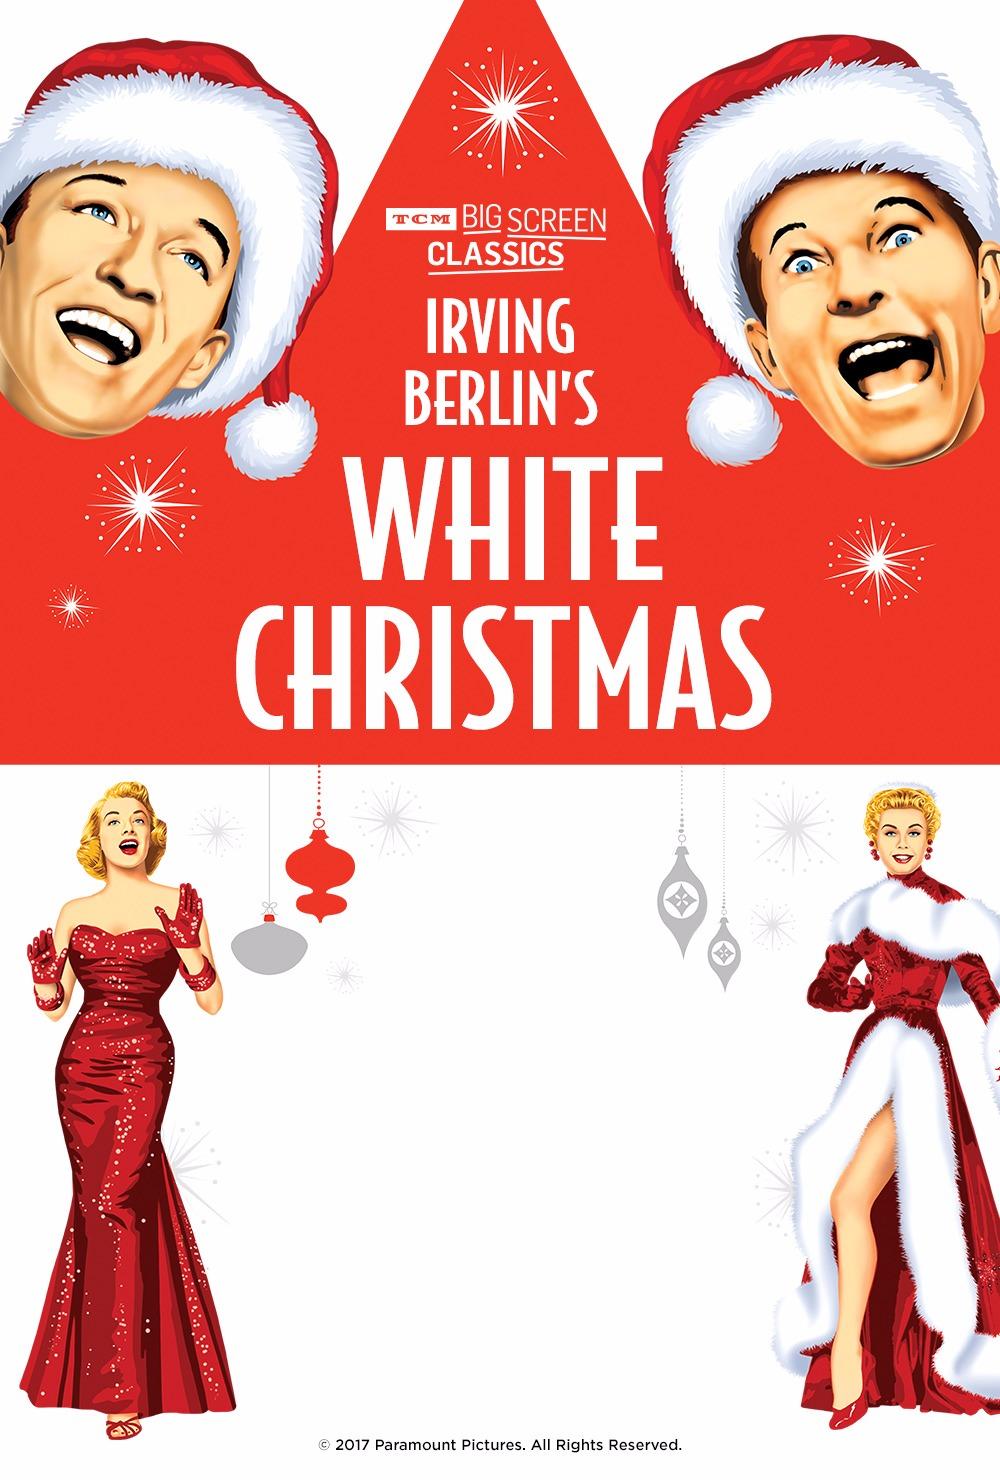 whitechristmas-poster-79e076742113c9ffe4d085224a1ec69a.jpg